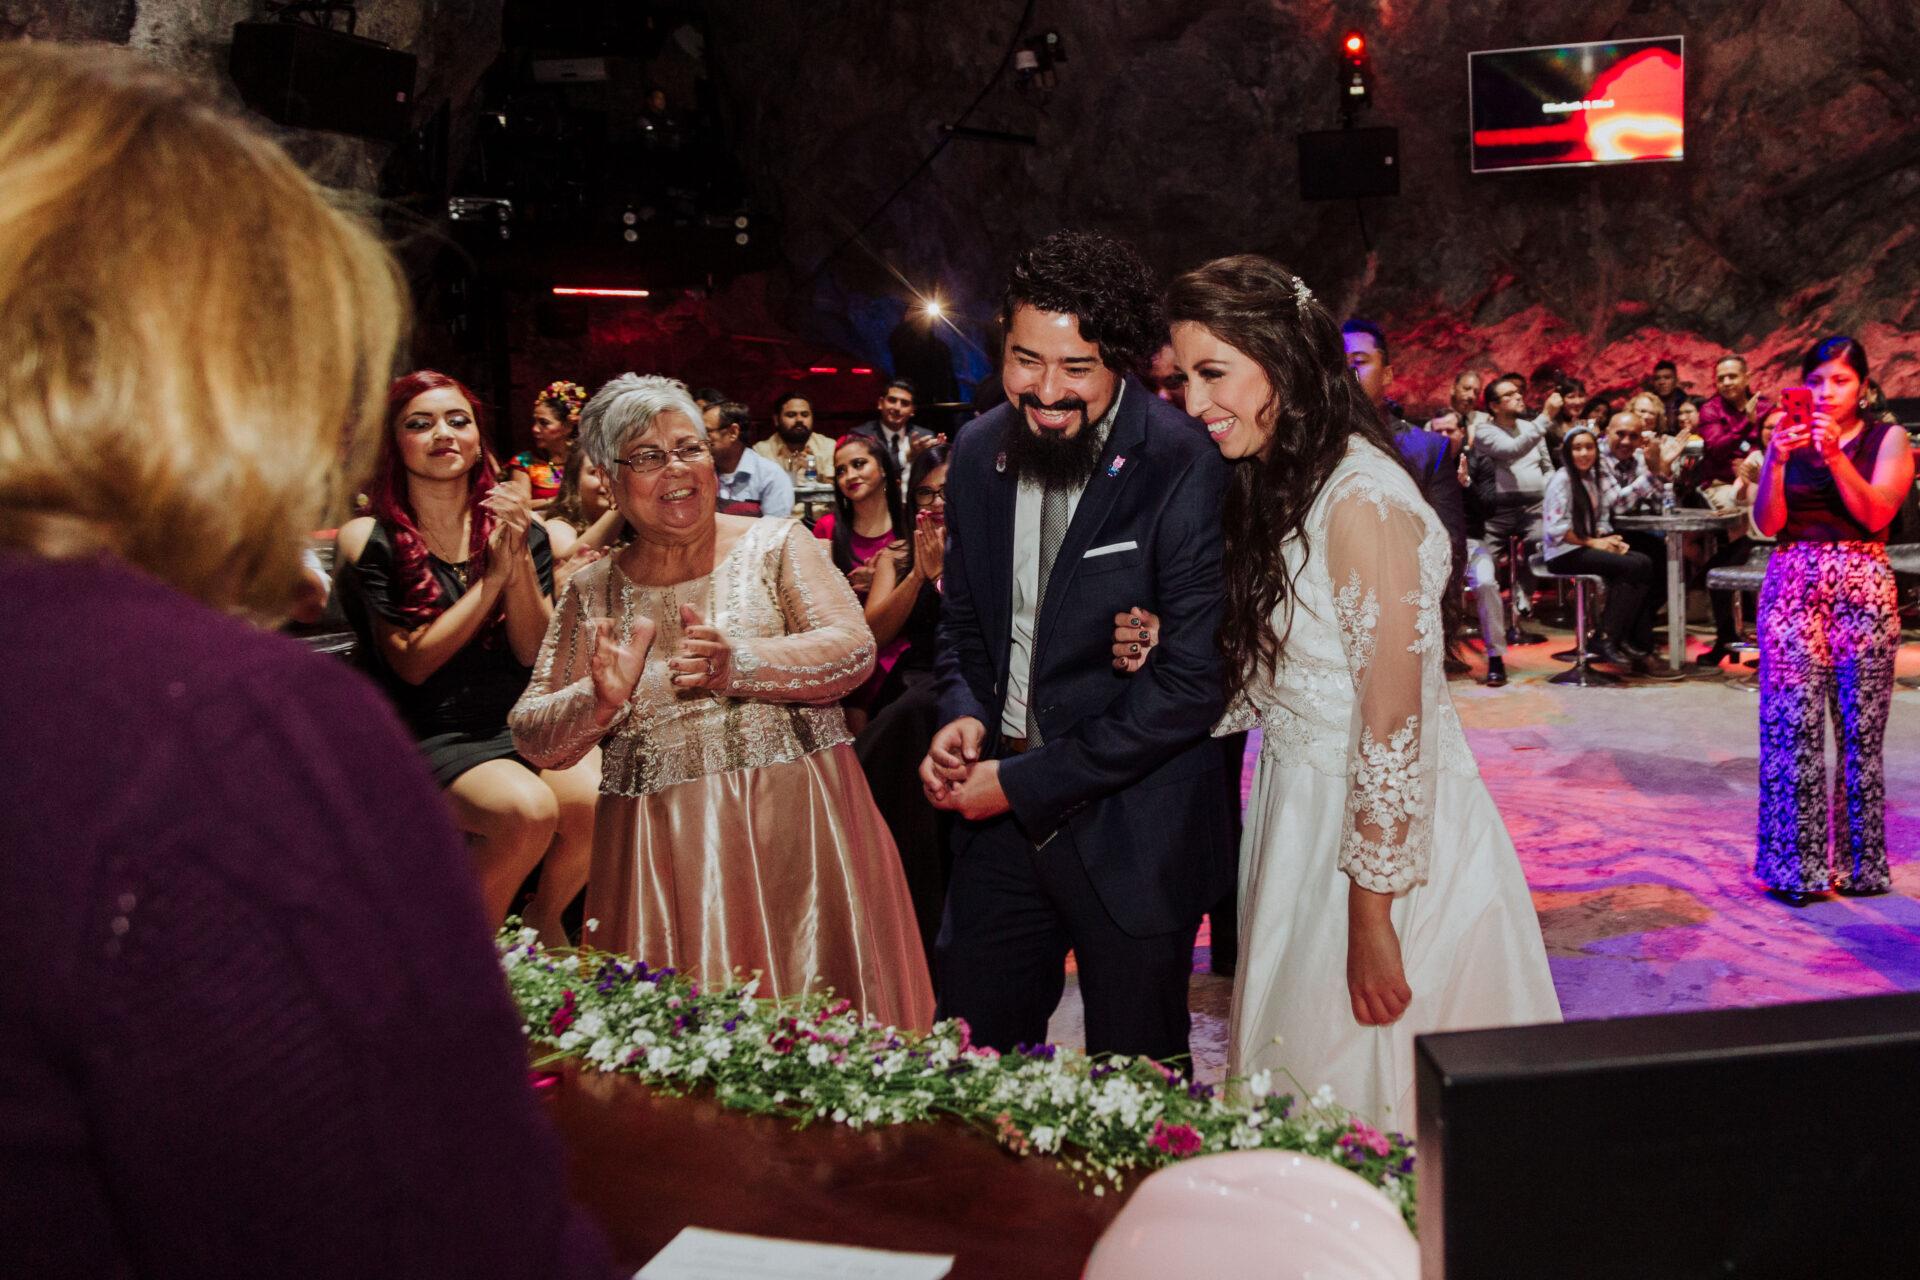 javier_noriega_fotografo_bodas_la_mina_club_zacatecas_wedding_photographer13